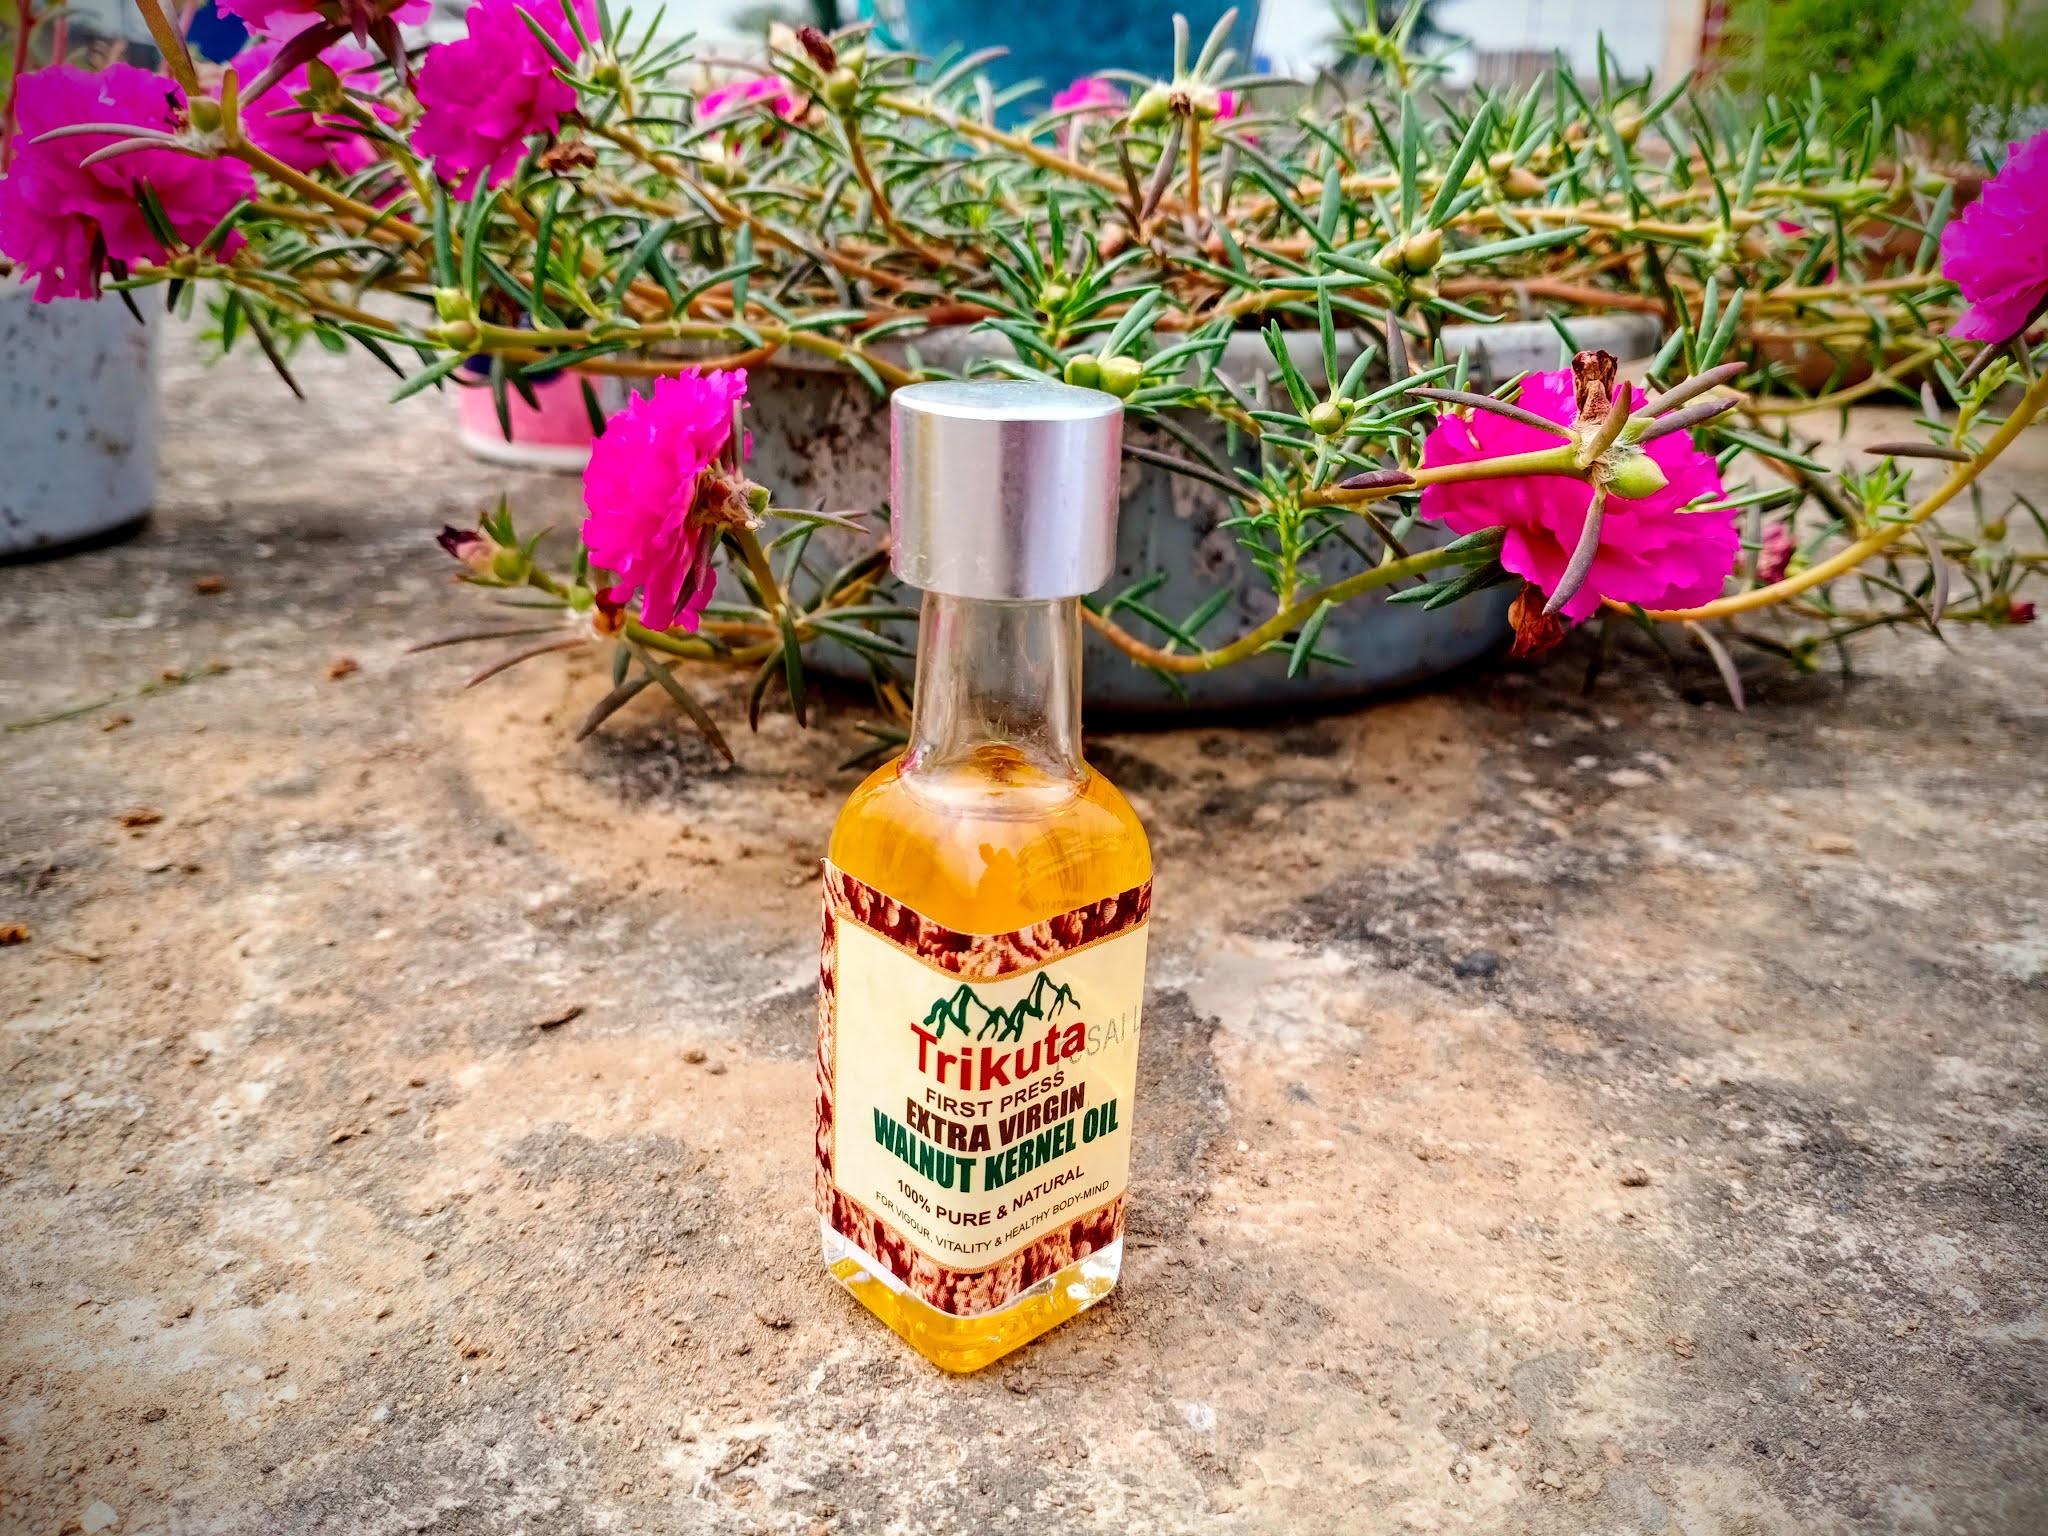 Walnut oil, benefits, uses, skincare, hydrating, antiinflammatory